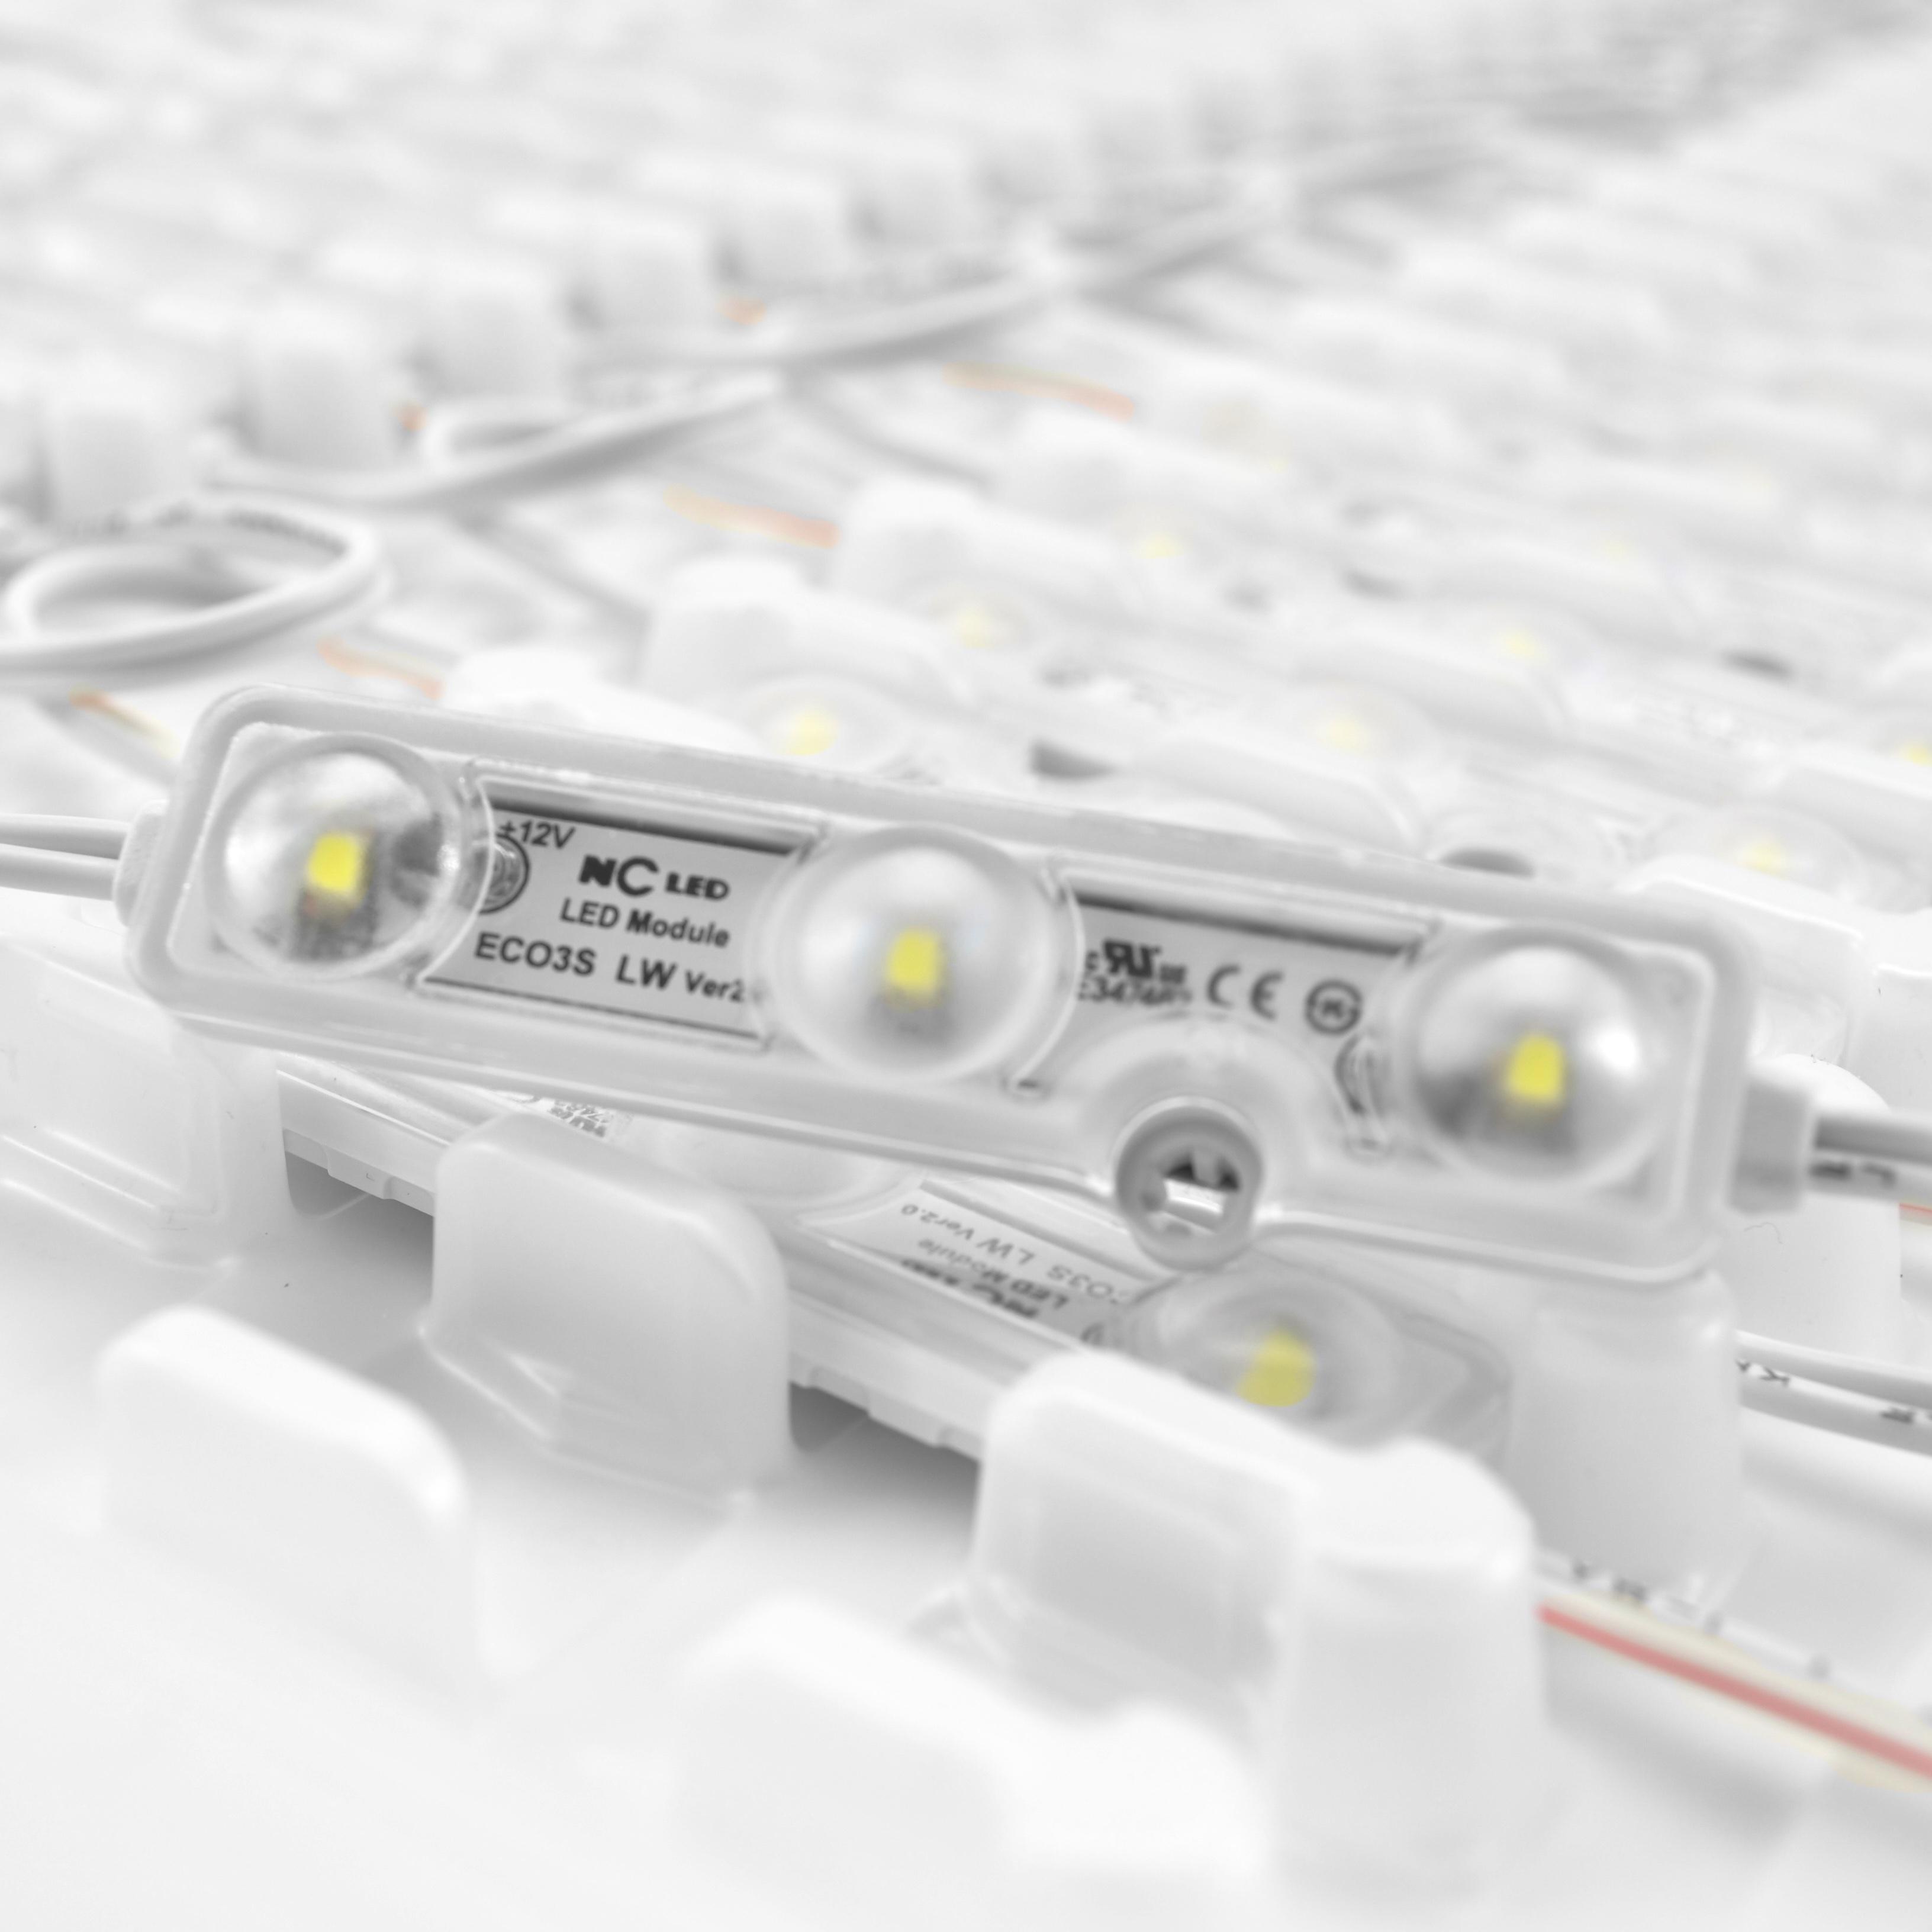 NcLED ECO3SLW2NS LED Module White 072W 10000K 100 Pack